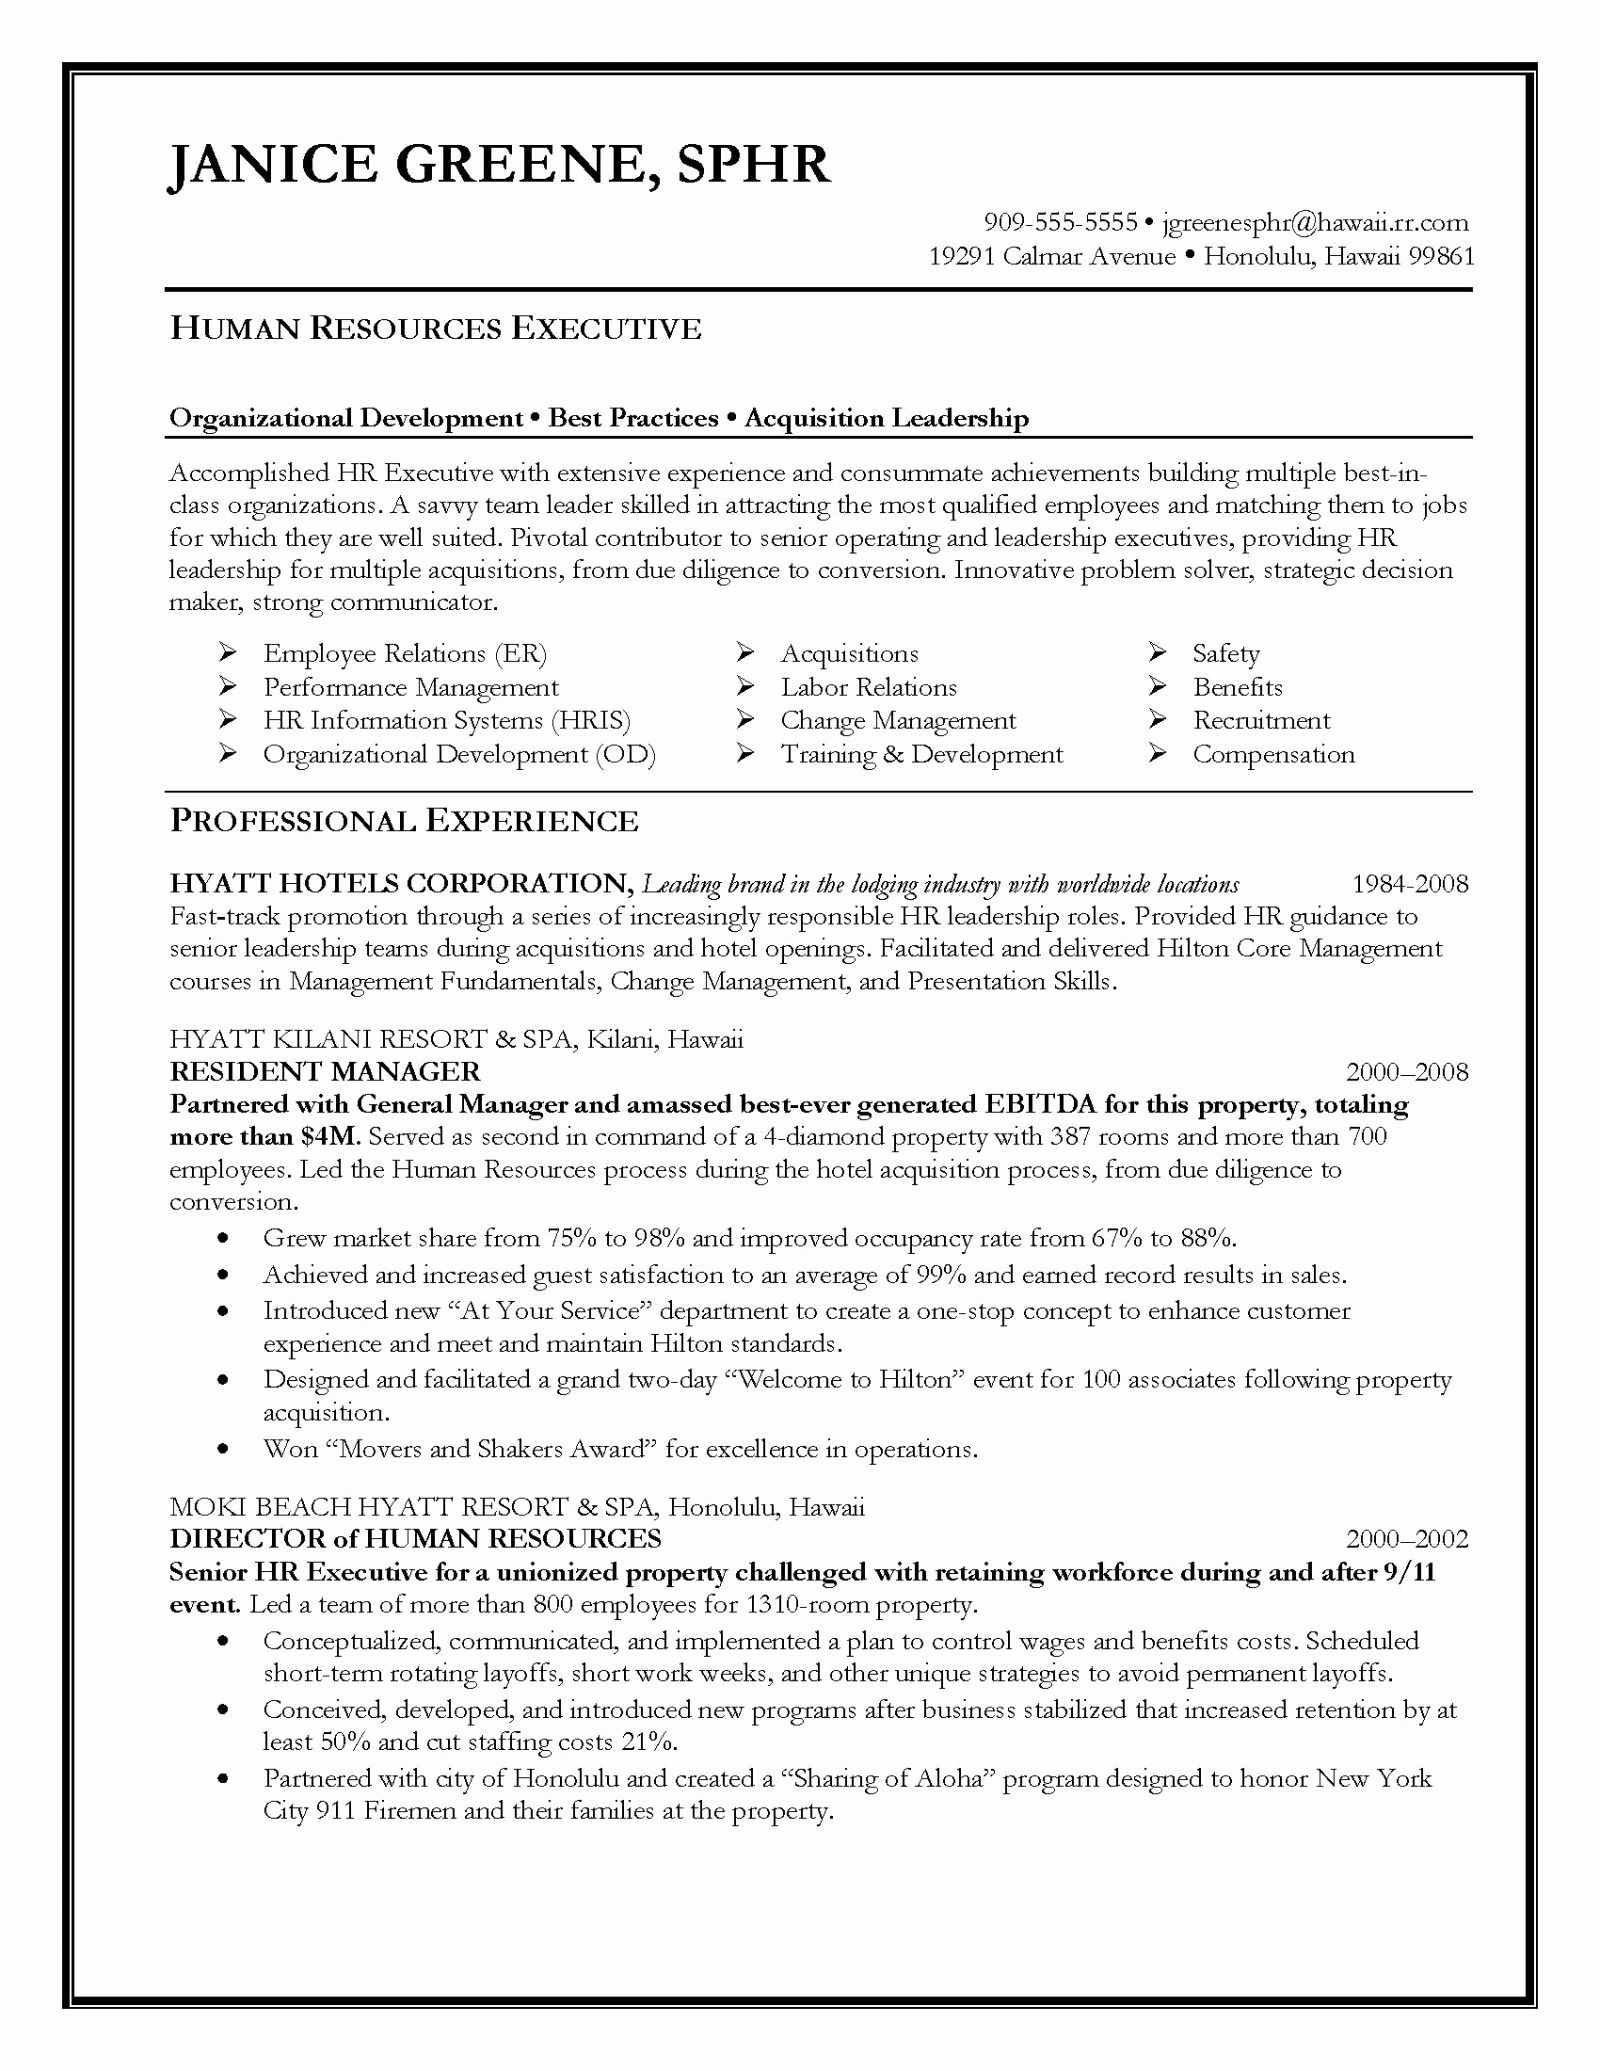 Free resume templates executive resume objective